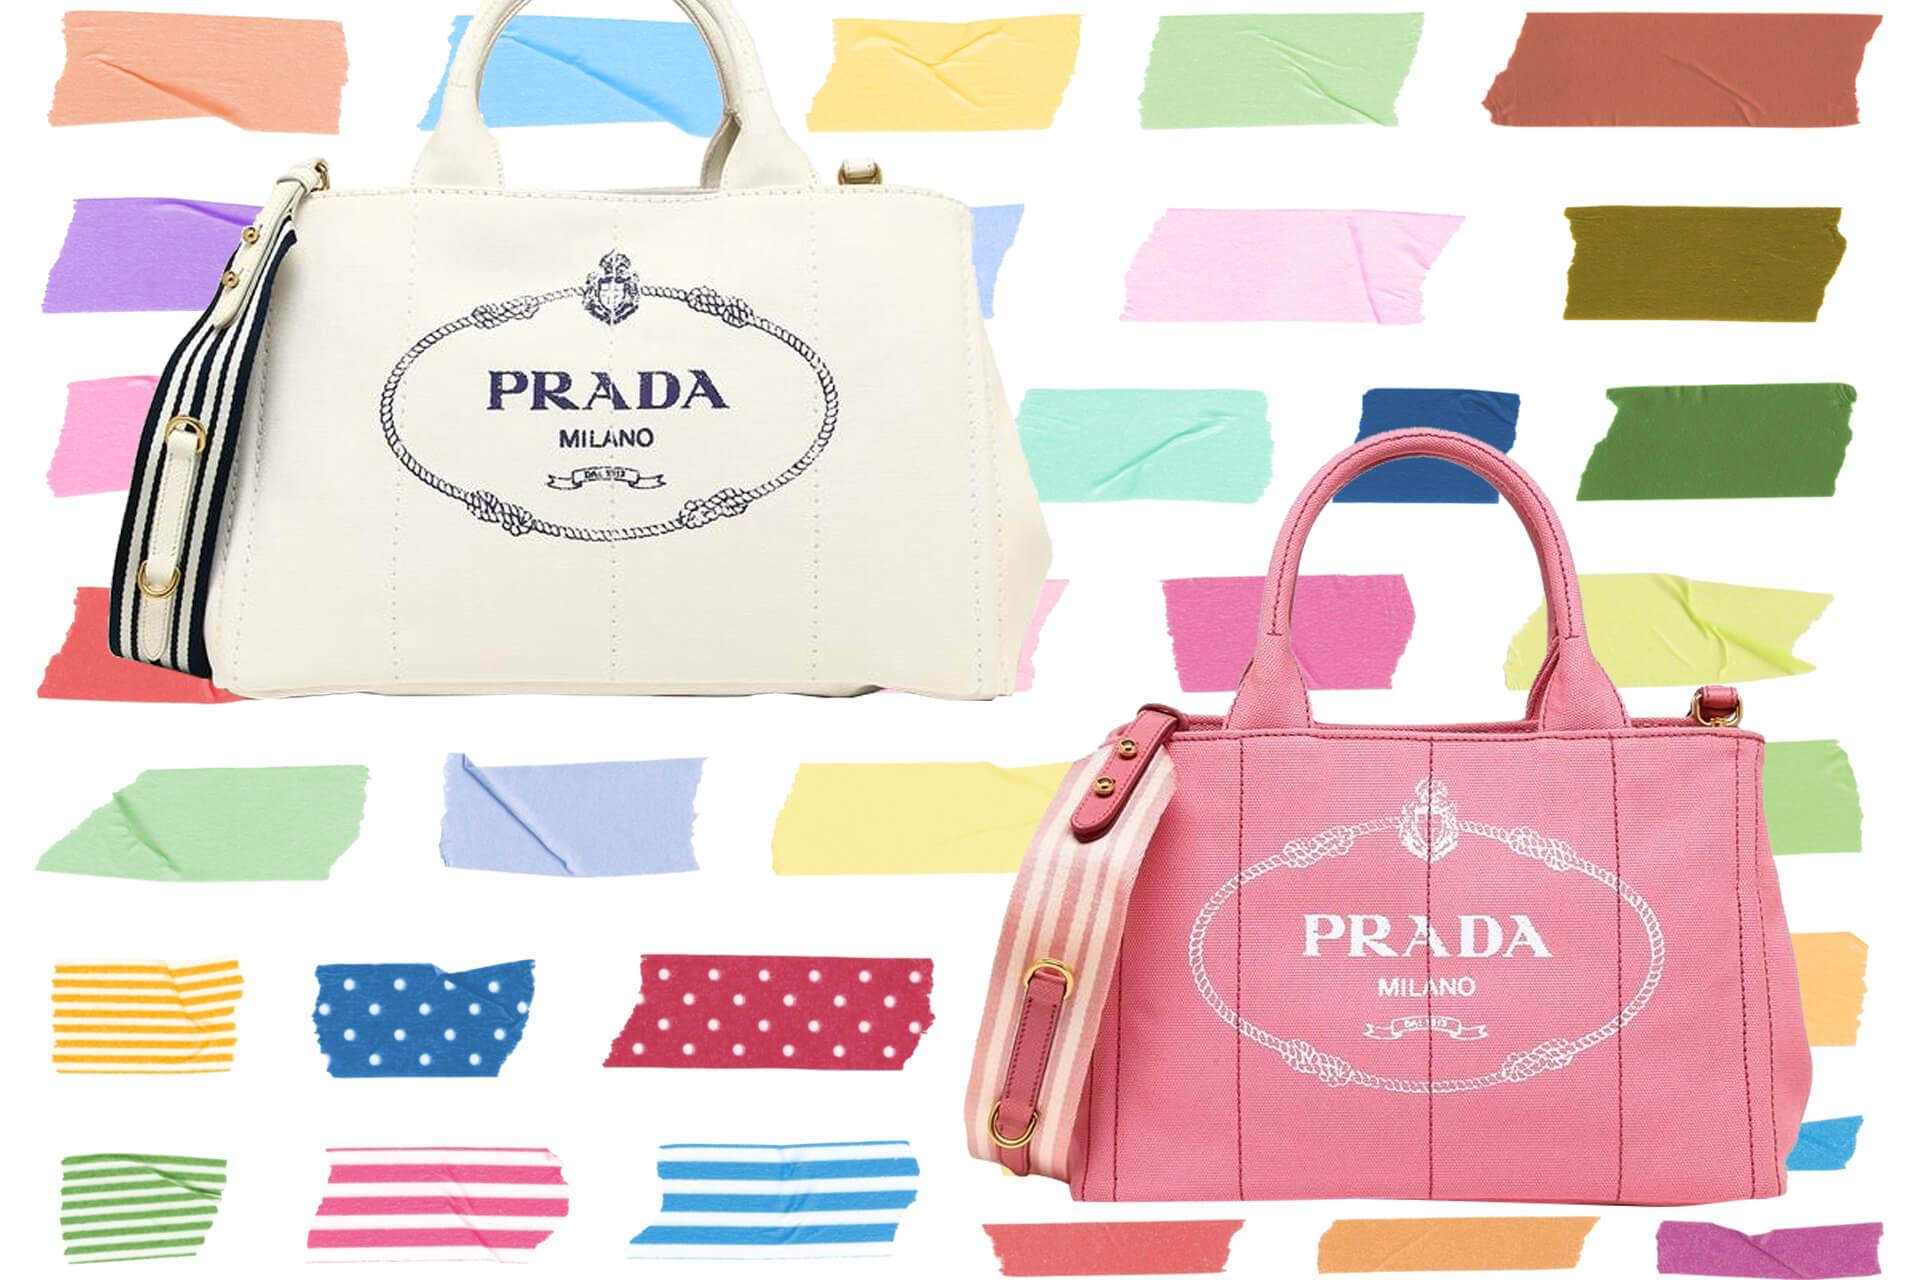 promo code 8d3a8 35e38 PRADA(プラダ)のトートバッグ「CANAPA(カナパ)」カラー選びの ...